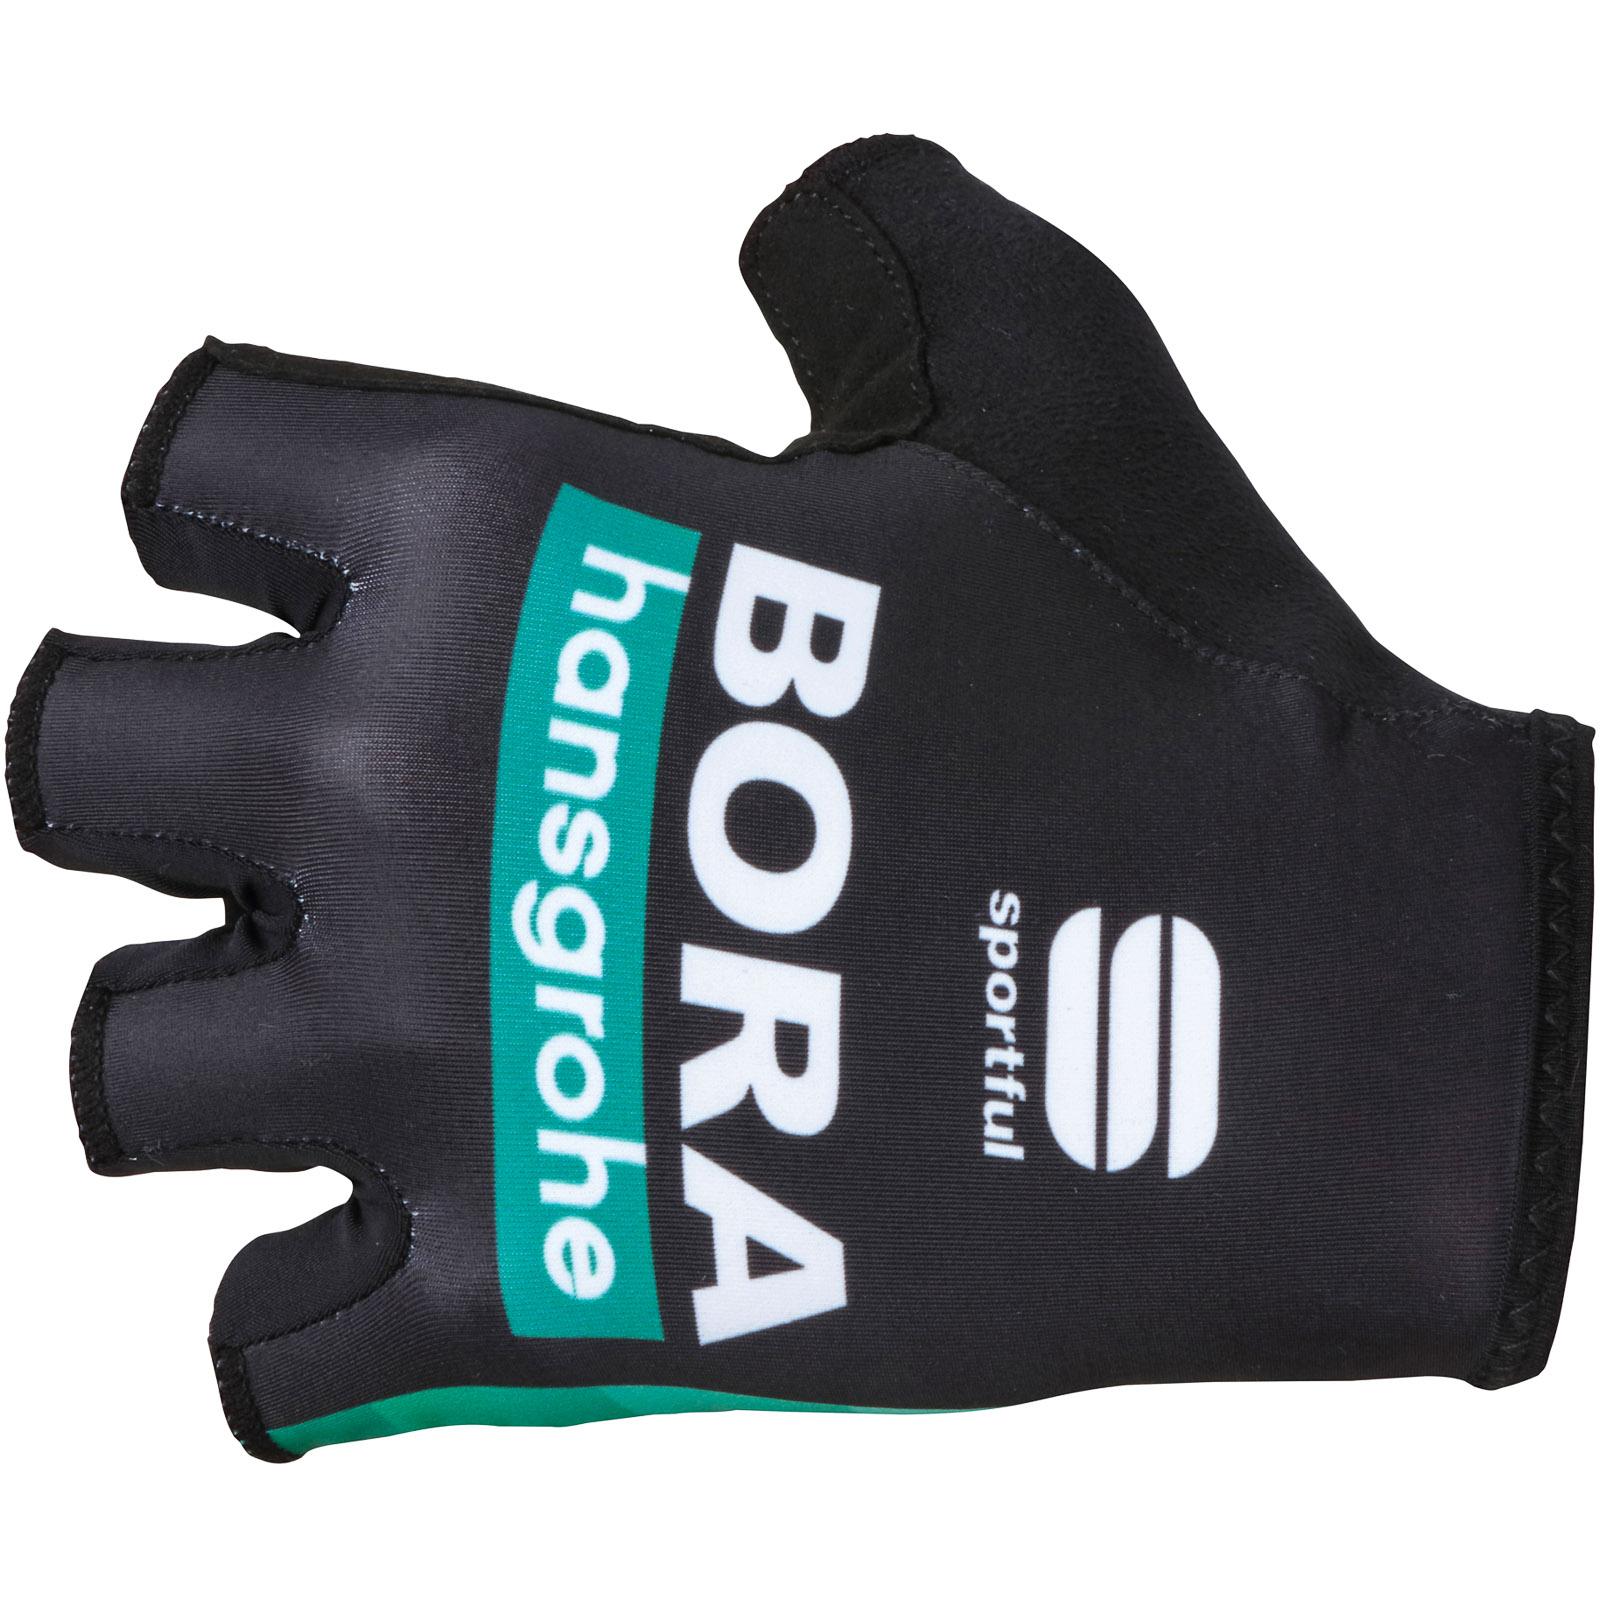 b1fc64669a056 Sportful BORA HANSGROHE cyklo rukavice čierne